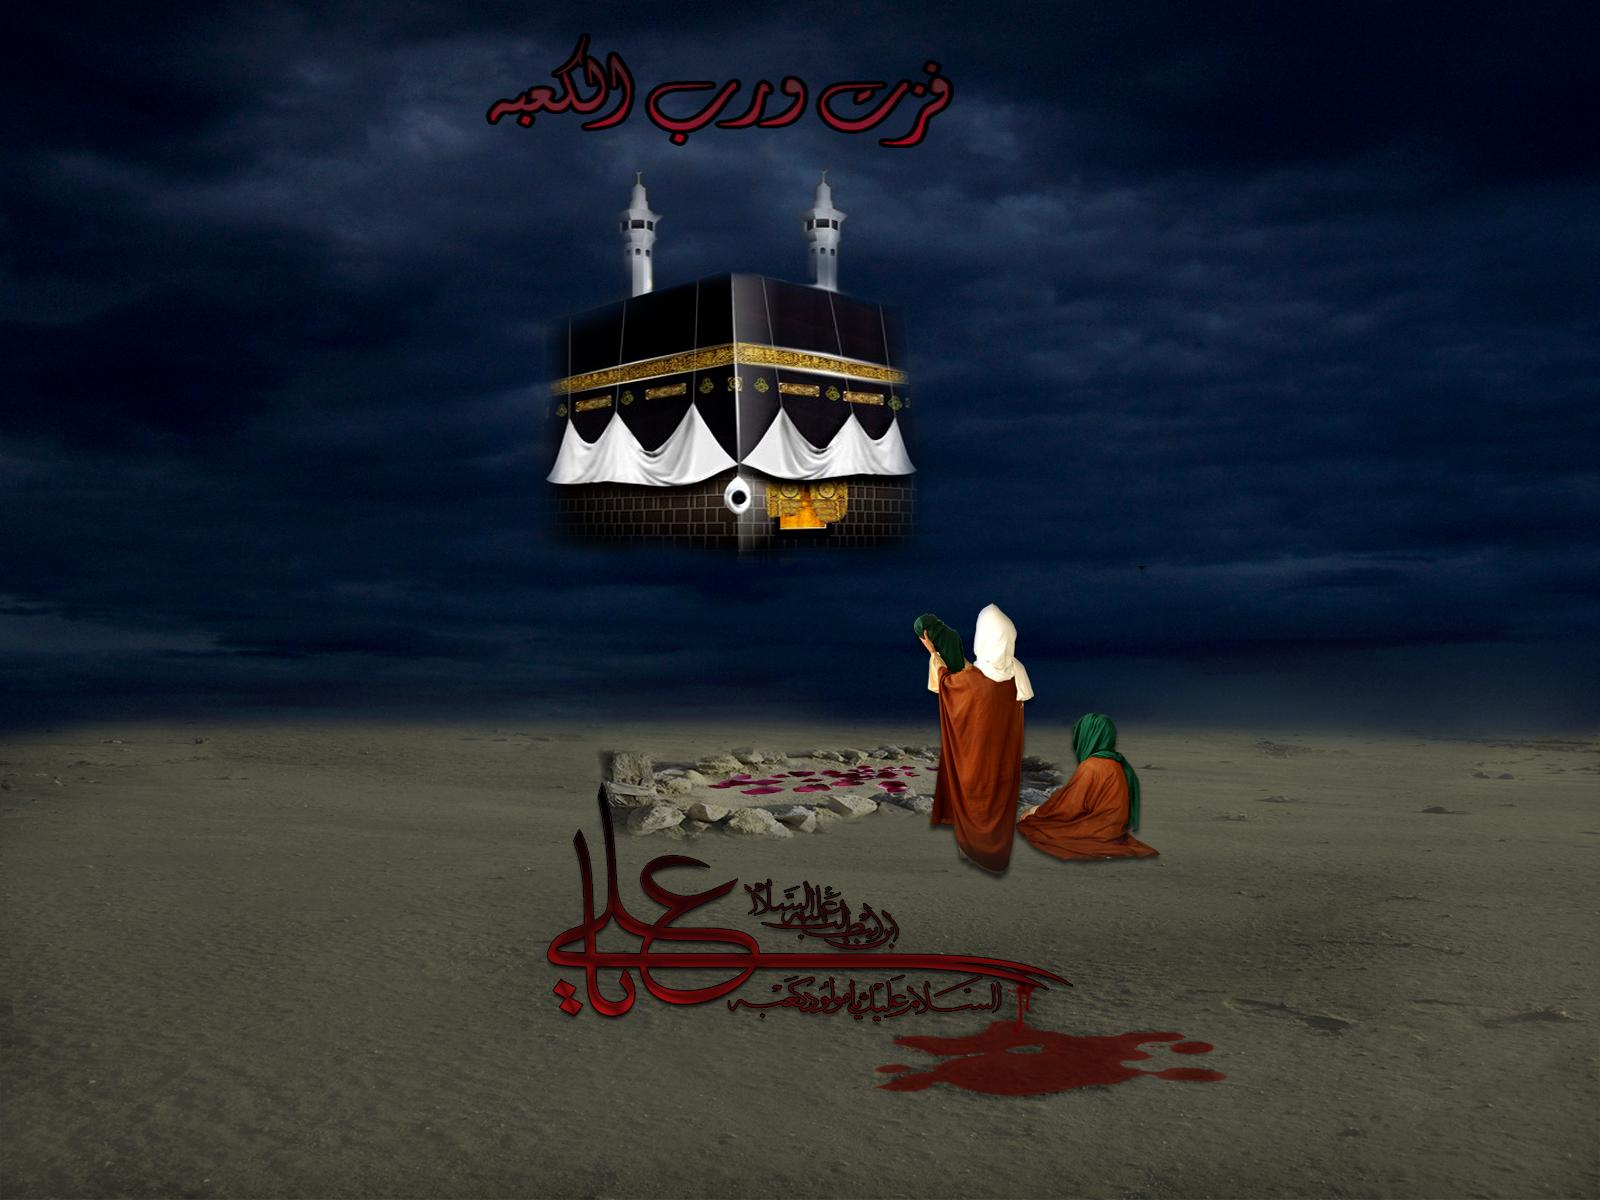 Hd wallpaper ya hussain - Ya Ali Mushkil Kusha Wallpaper Live Hd Wallpaper Hq Pictures Images